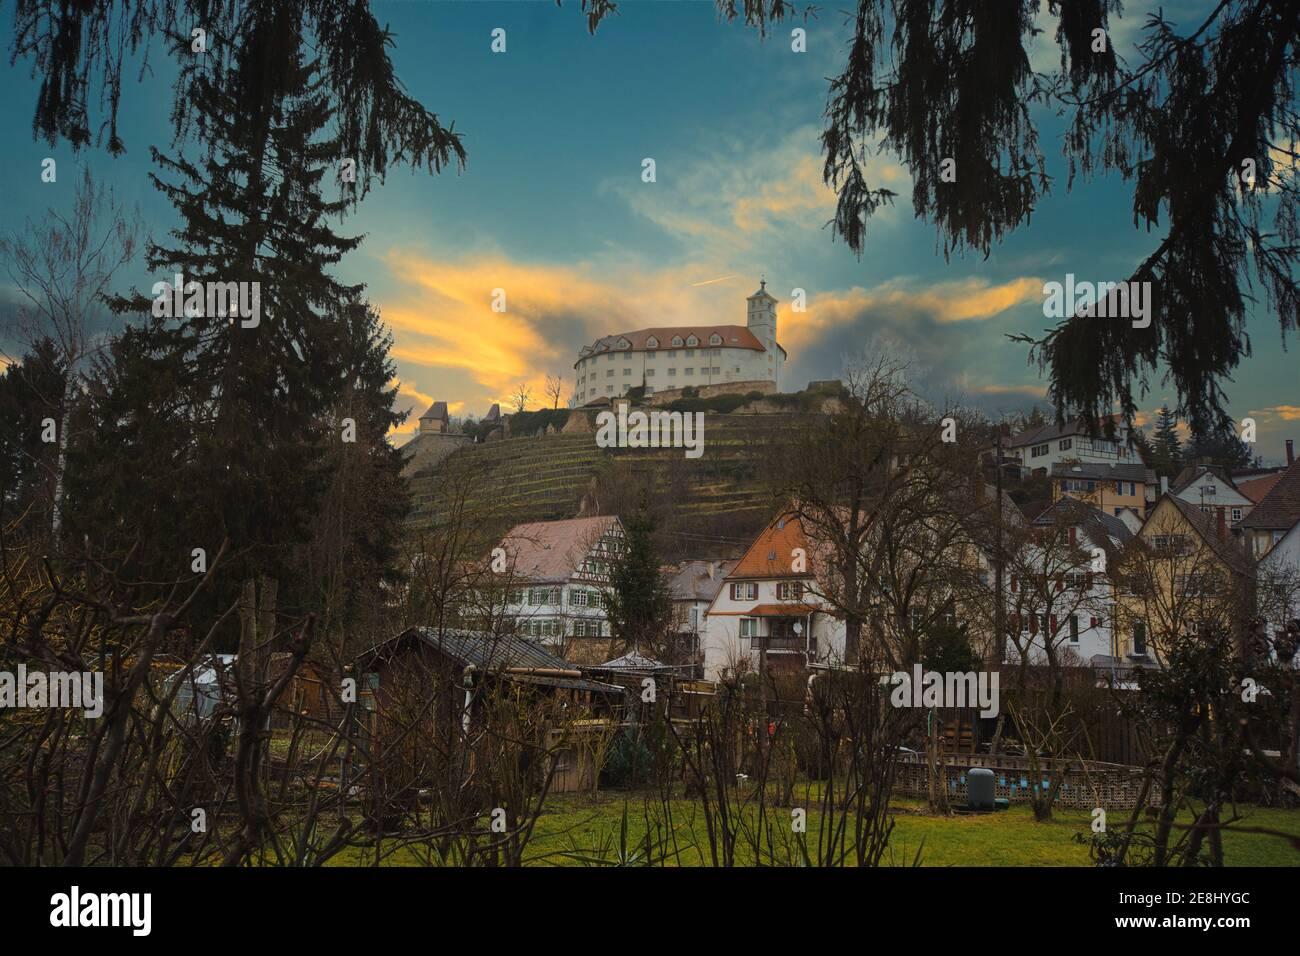 Schloss Kaltenstein in Vaihingen an der Enz - a castle in South Germany in a little village Stock Photo